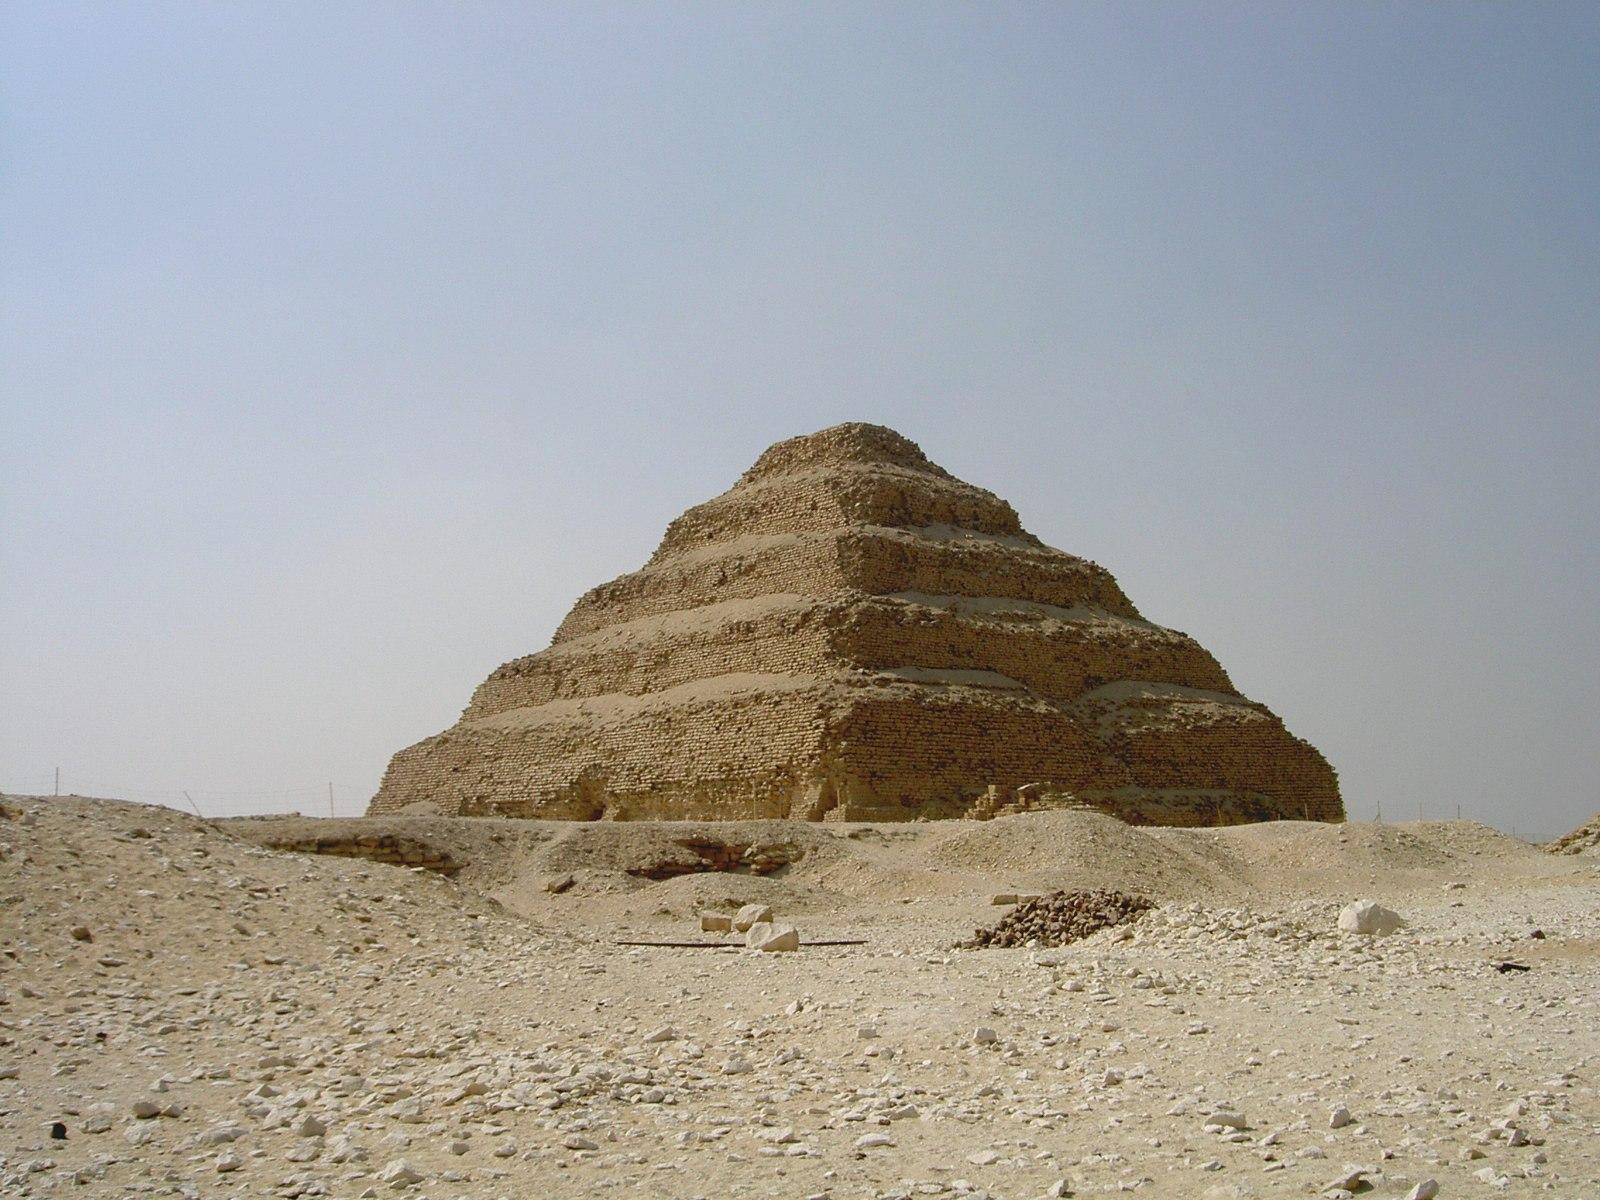 Pyramid_of_Djoser_2.jpg (1600×1200)